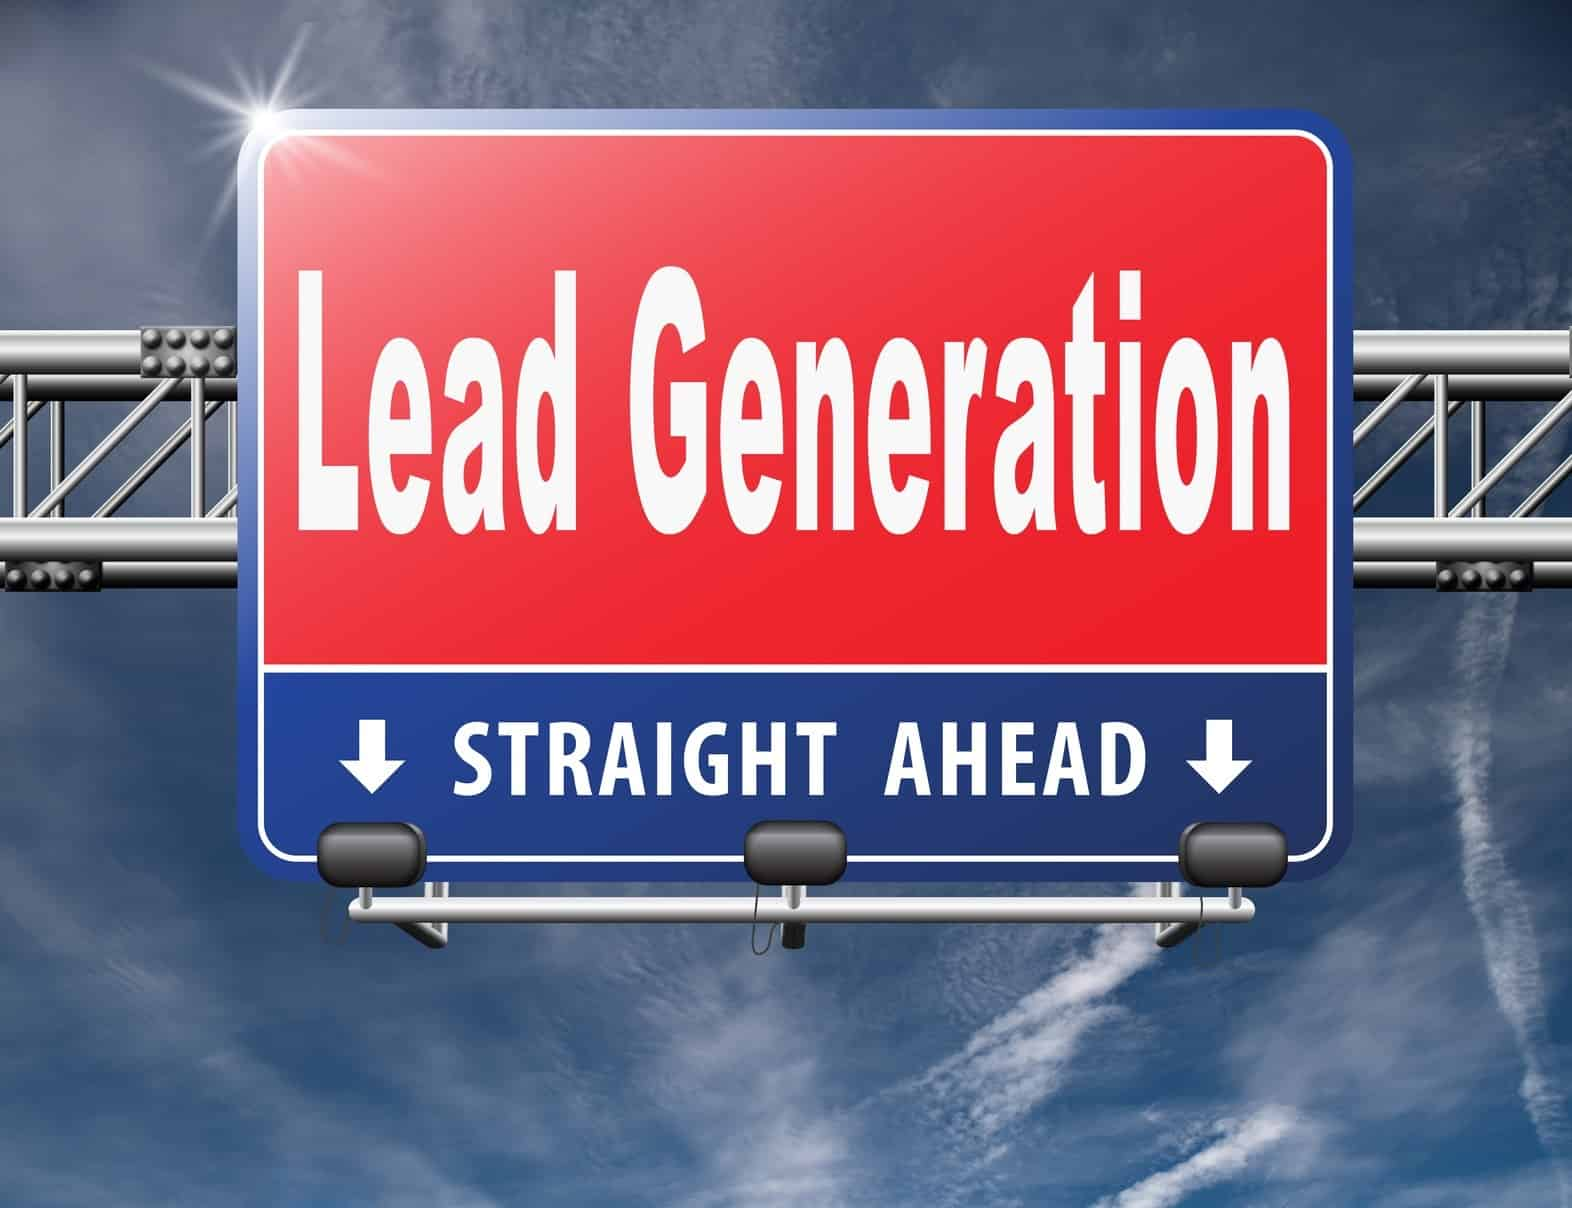 Lead generation, internet marketing for online market and commerce sales, road sign billboard...